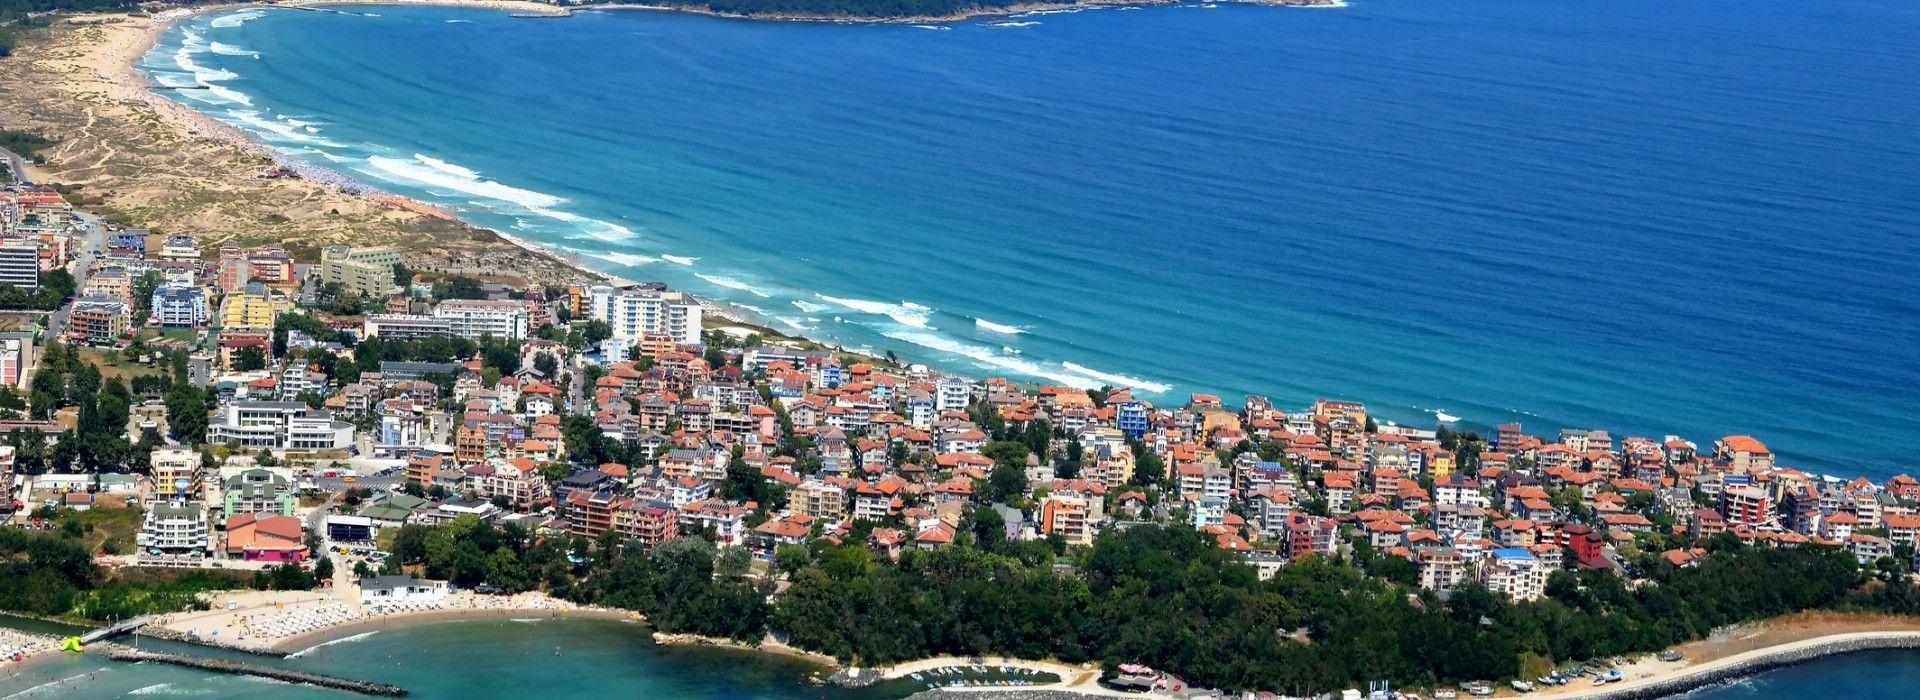 Bulgaria Tours and Trips to Bulgaria